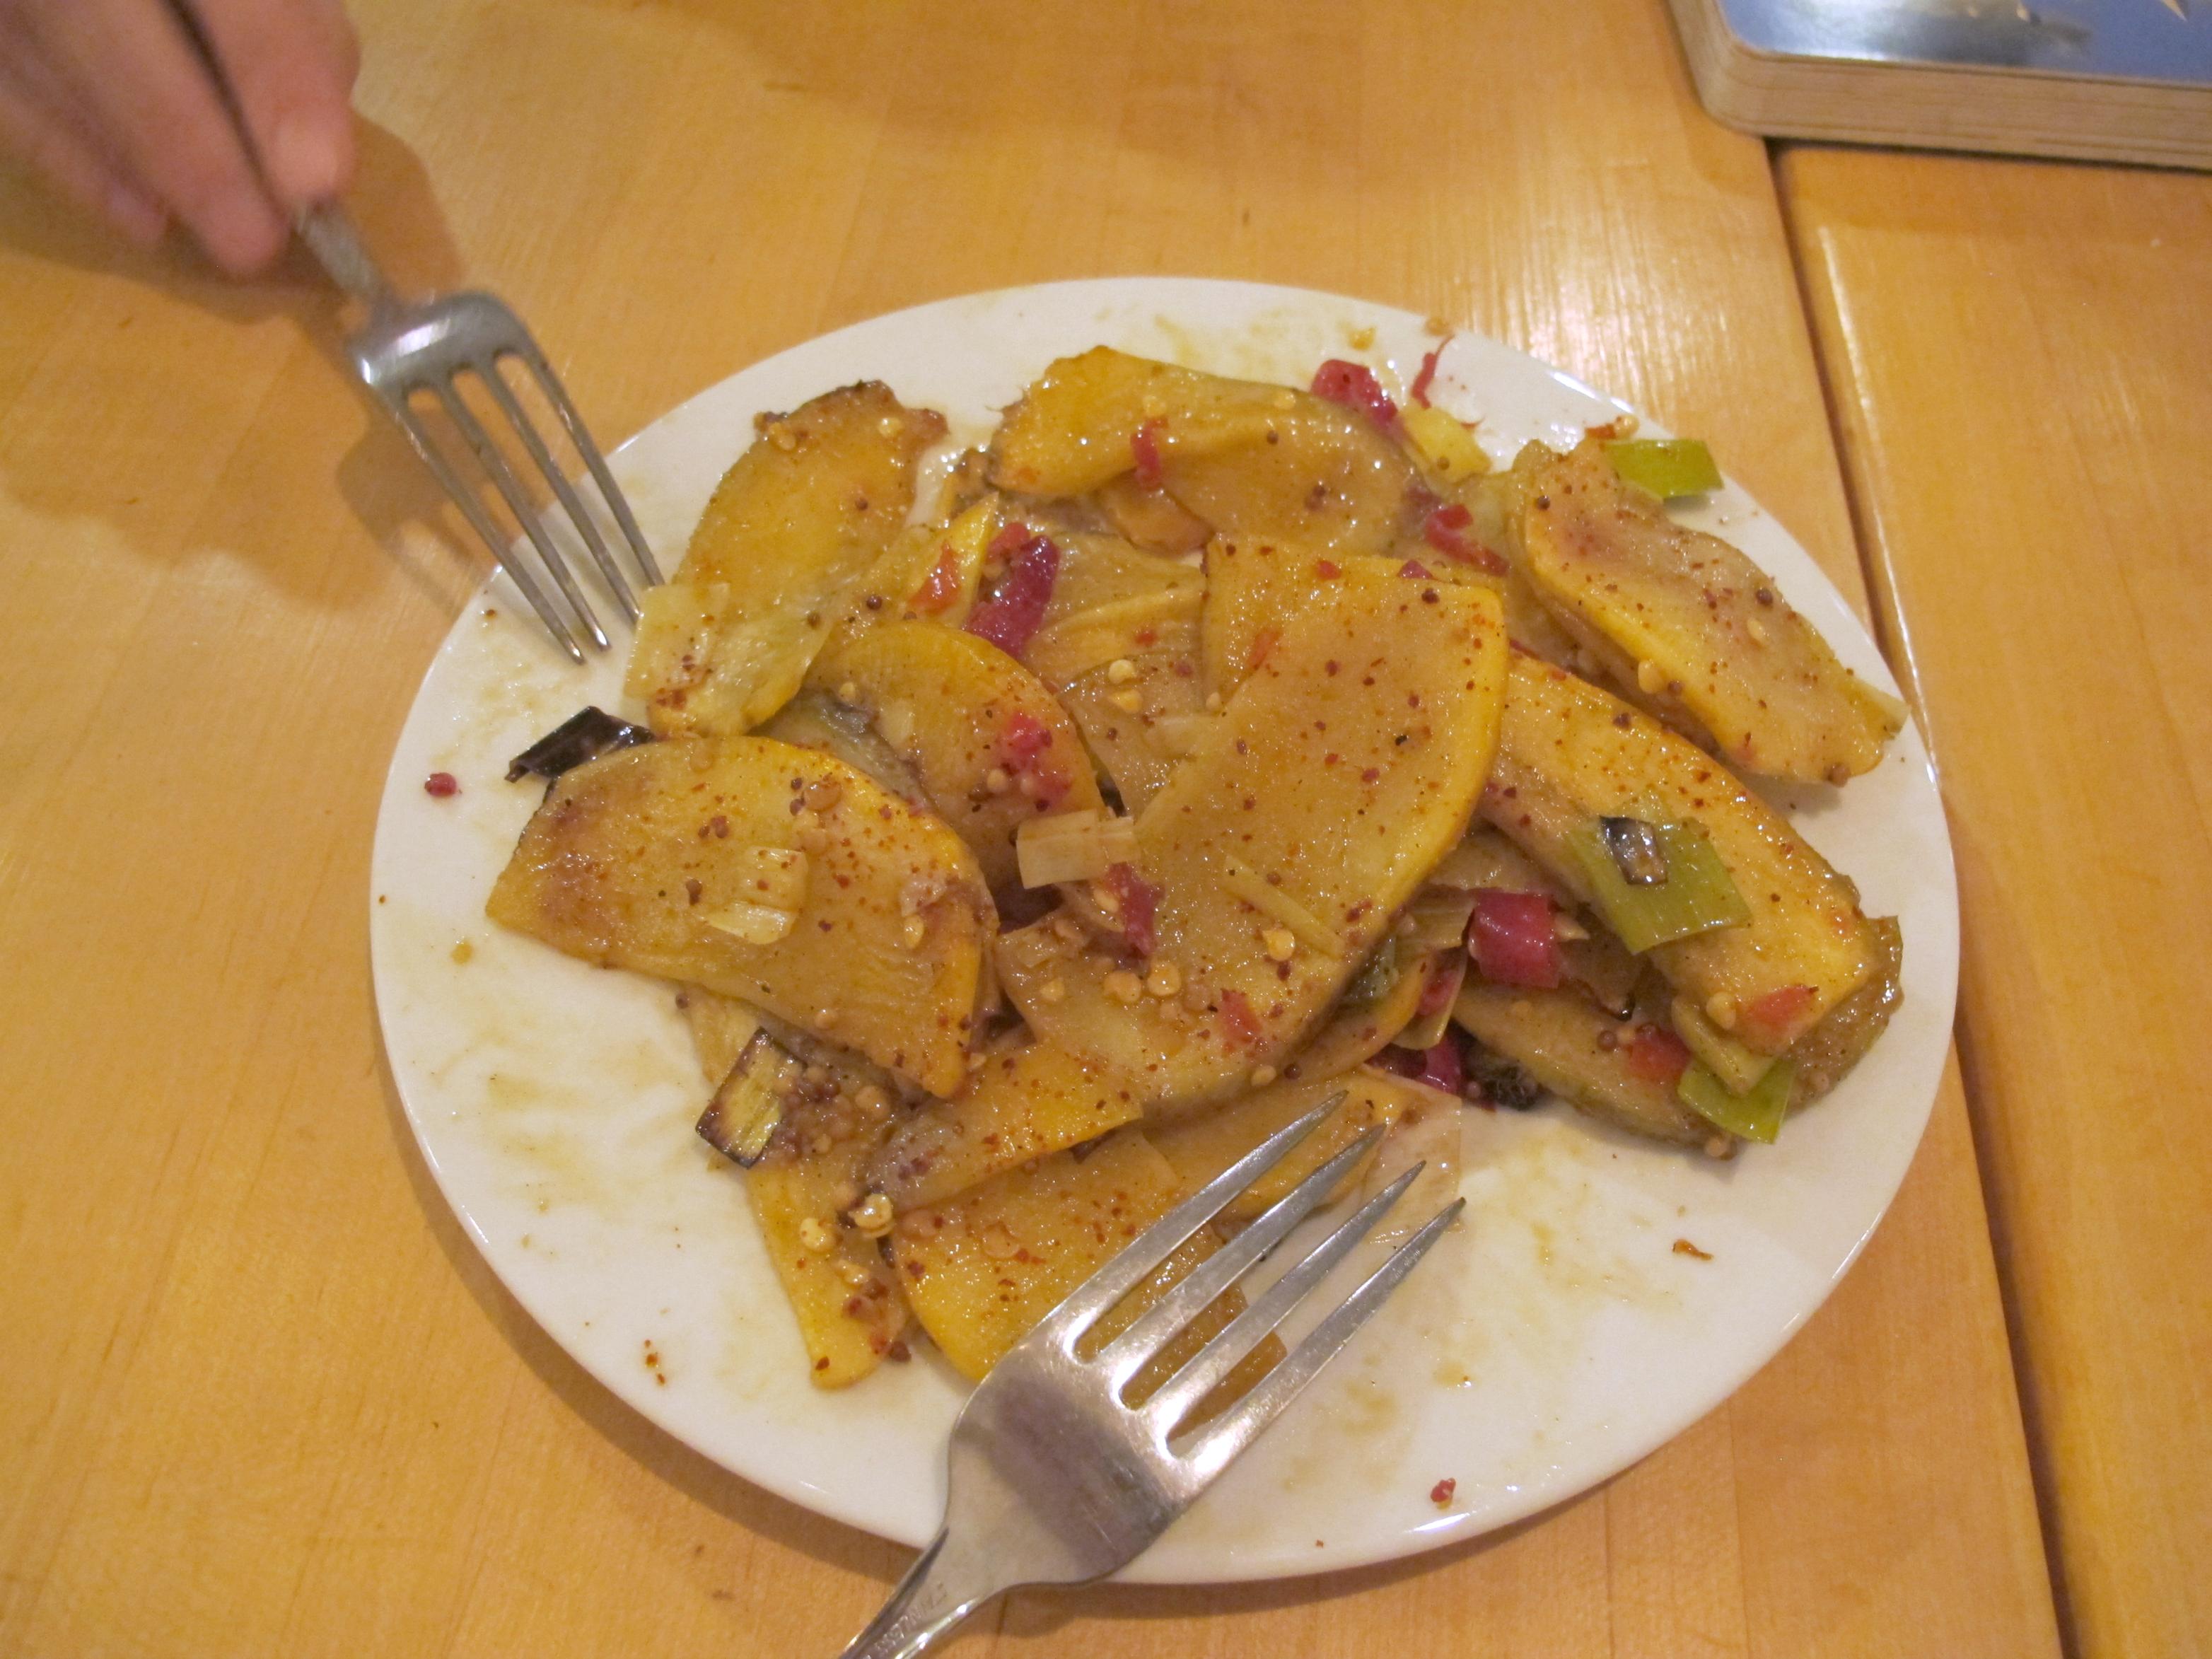 Roasted leeks and rutabaga at Handsome Pizza in Portland, Oregon | vegetarianPDX